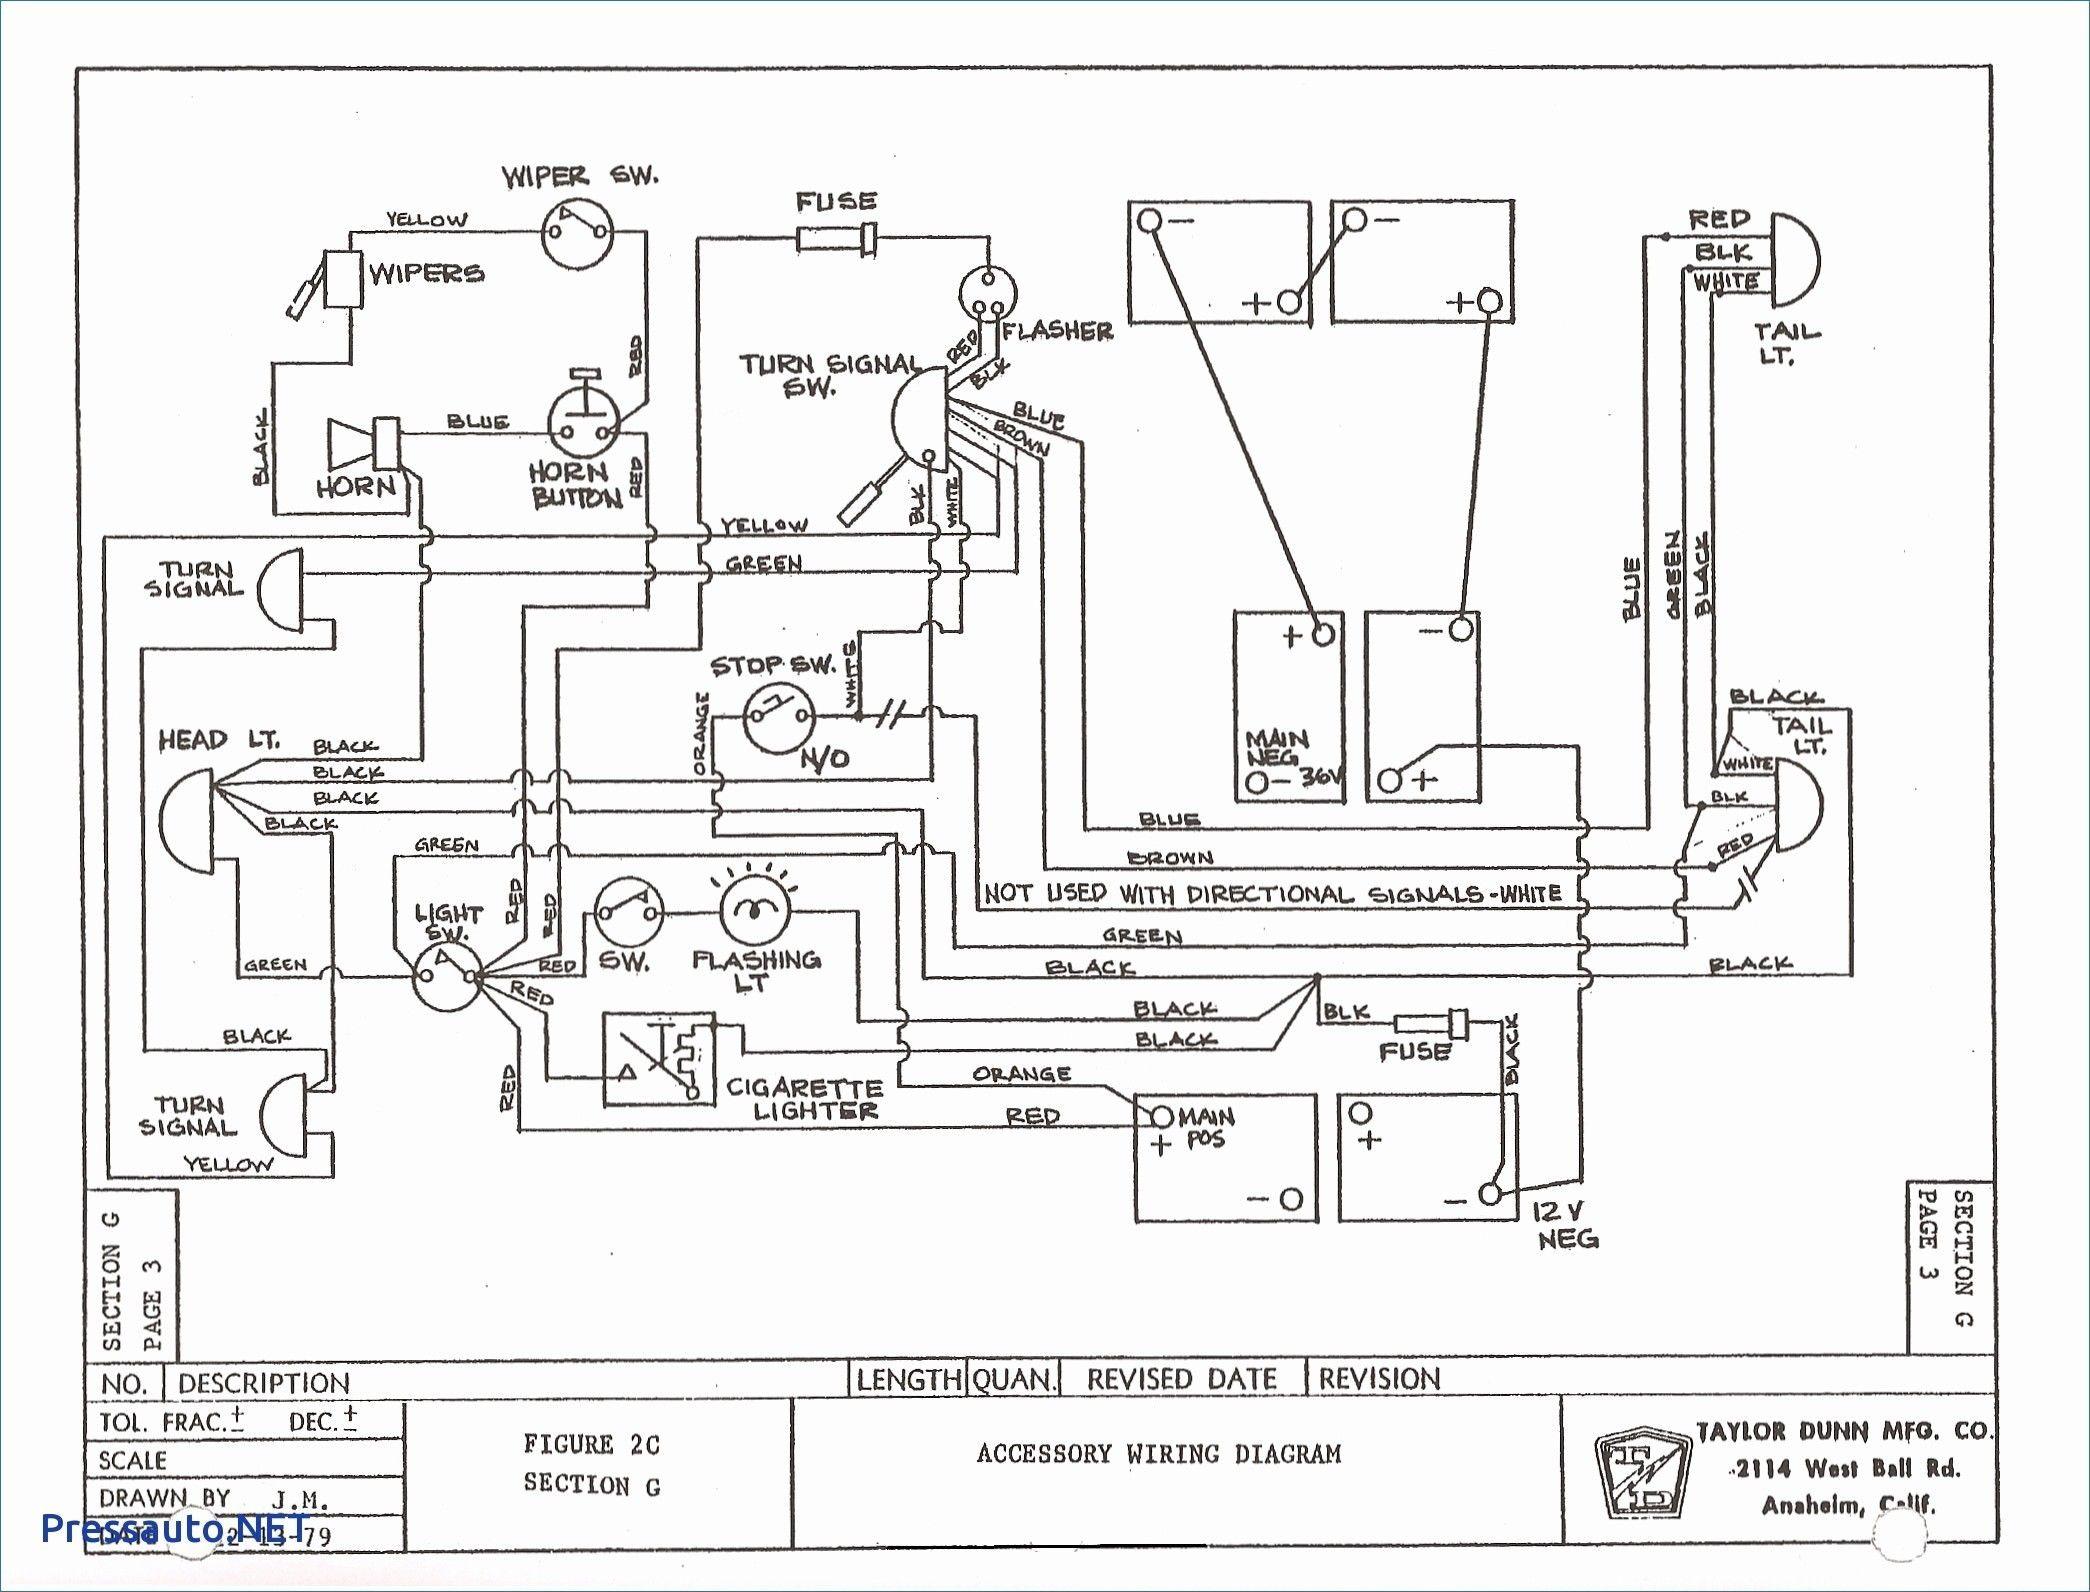 Unique Wiring Diagram Starter Generator #diagram #diagramtemplate  #diagramsample | Plano eléctrico, Carrito de golf, Planos  Pinterest